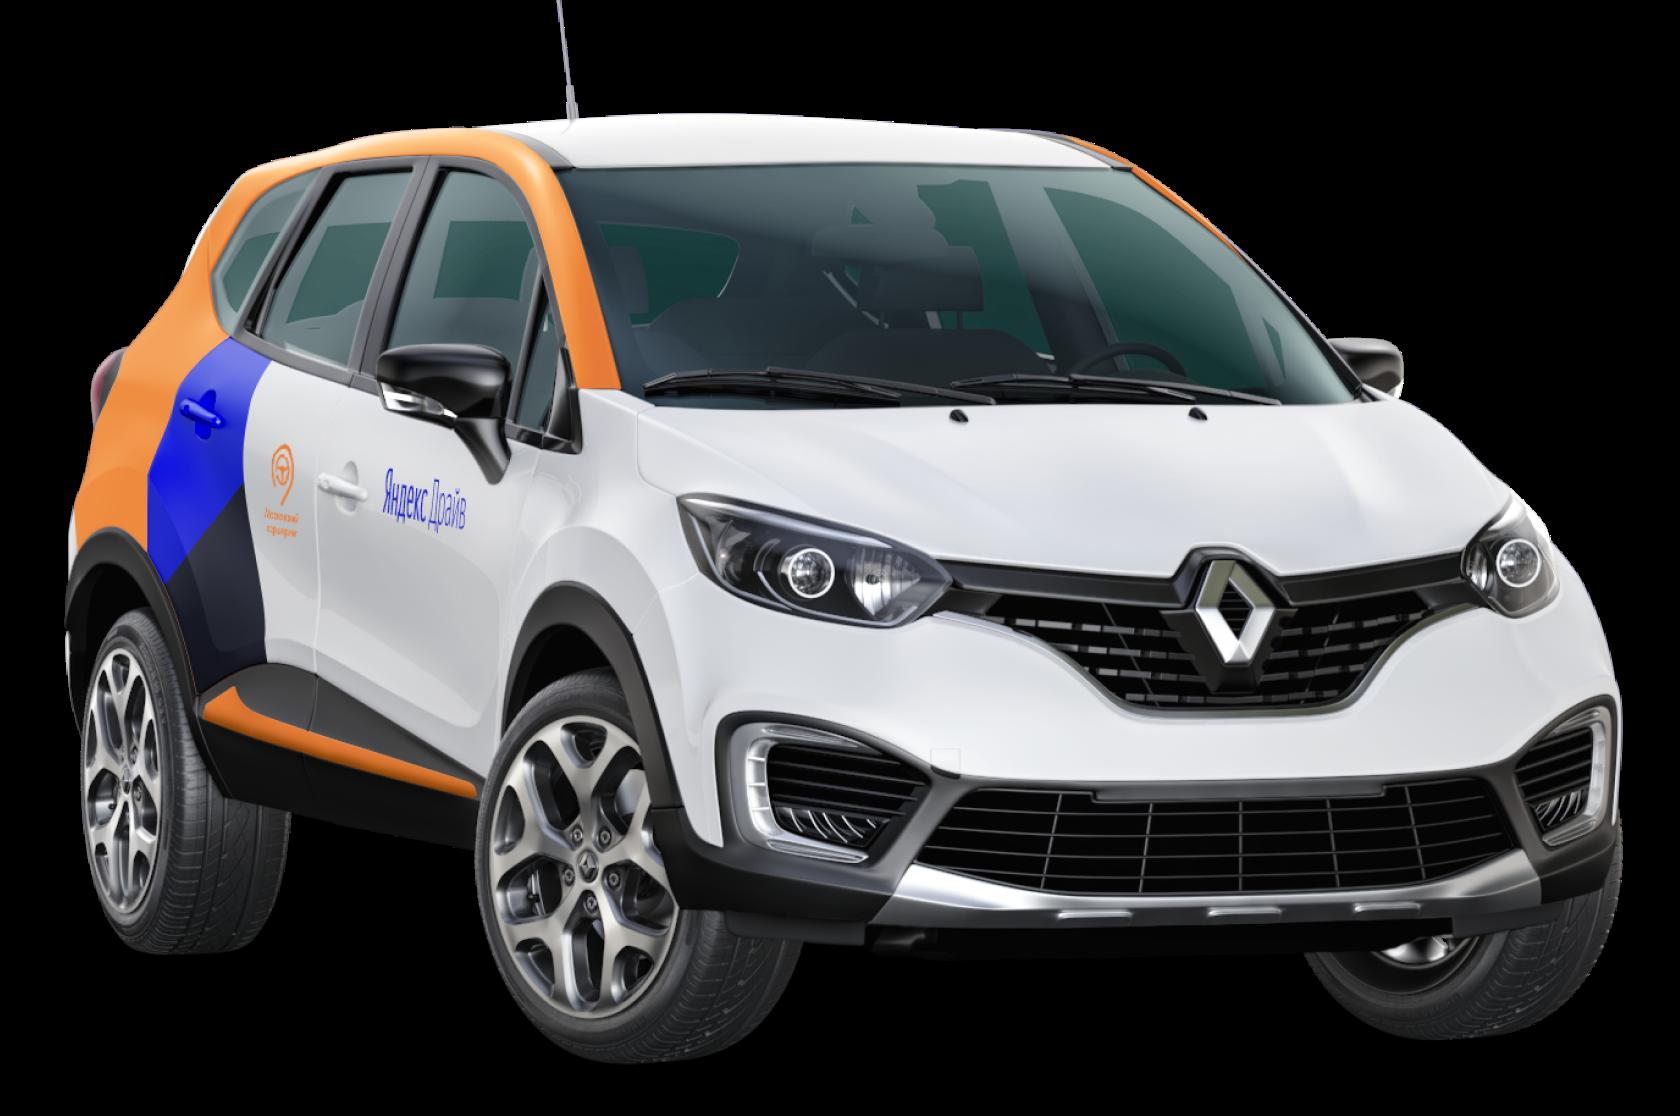 Renault<br>Kaptur